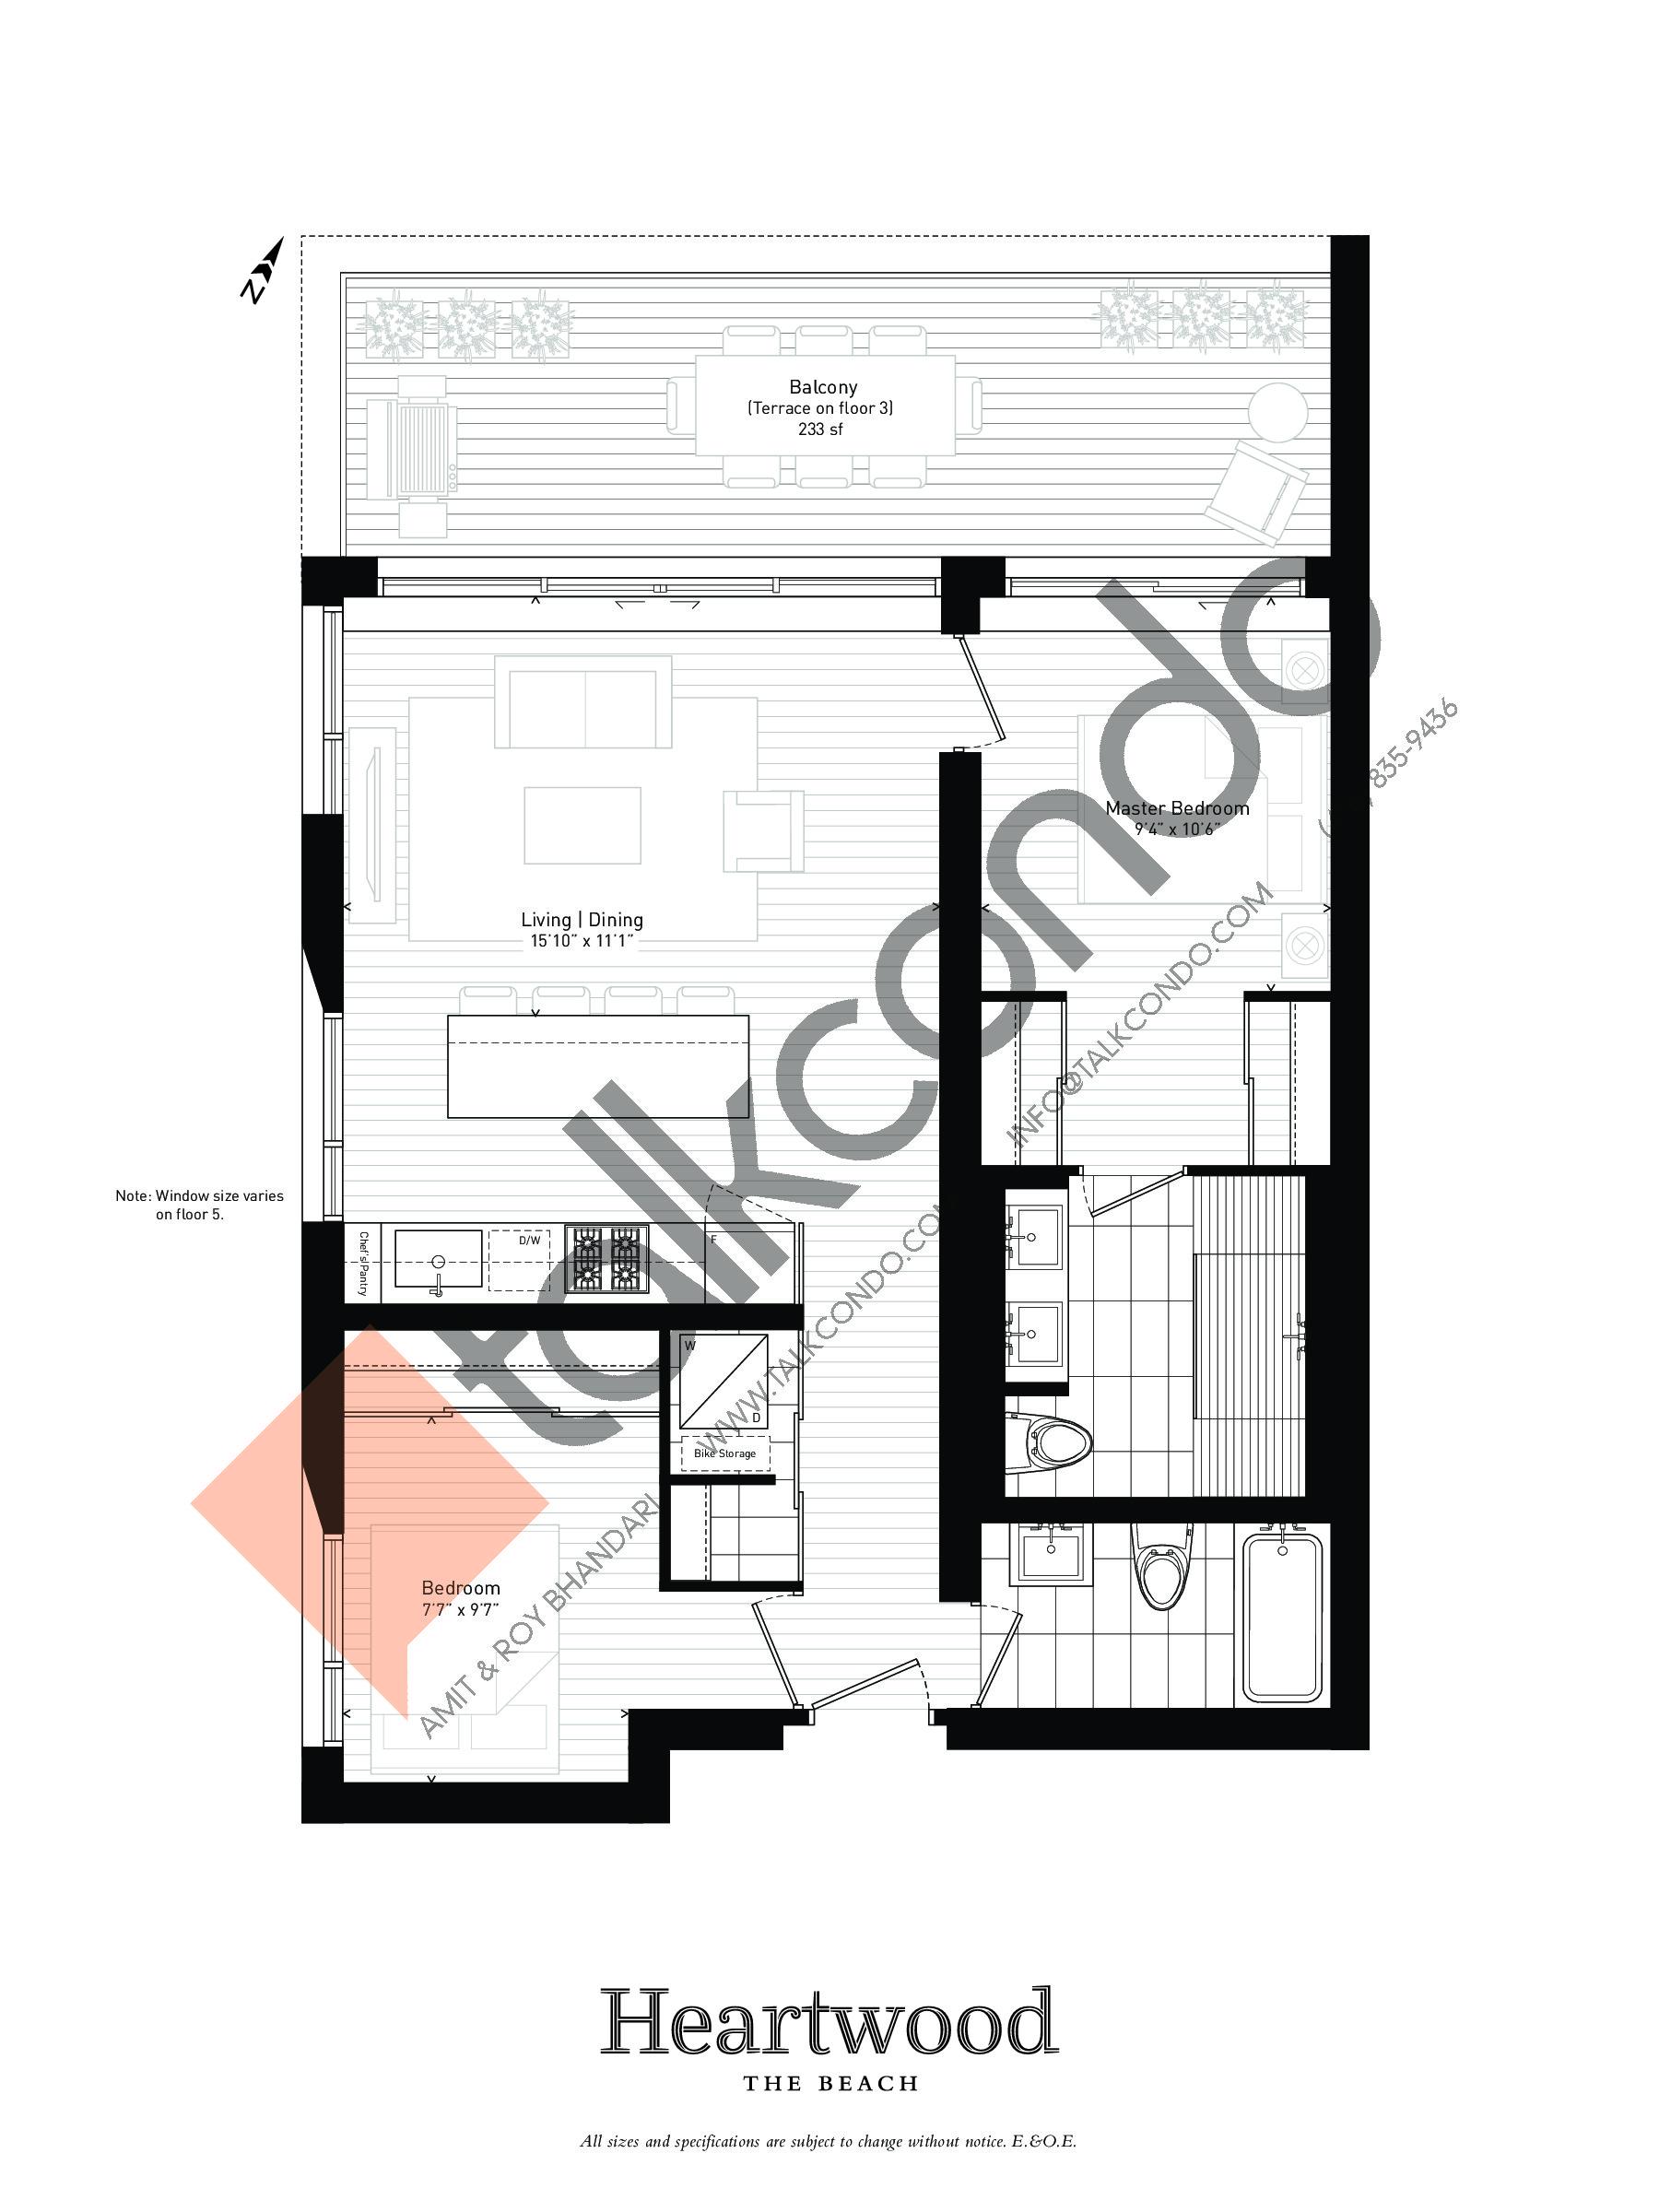 04 Floor Plan at Heartwood the Beach Condos - 923 sq.ft